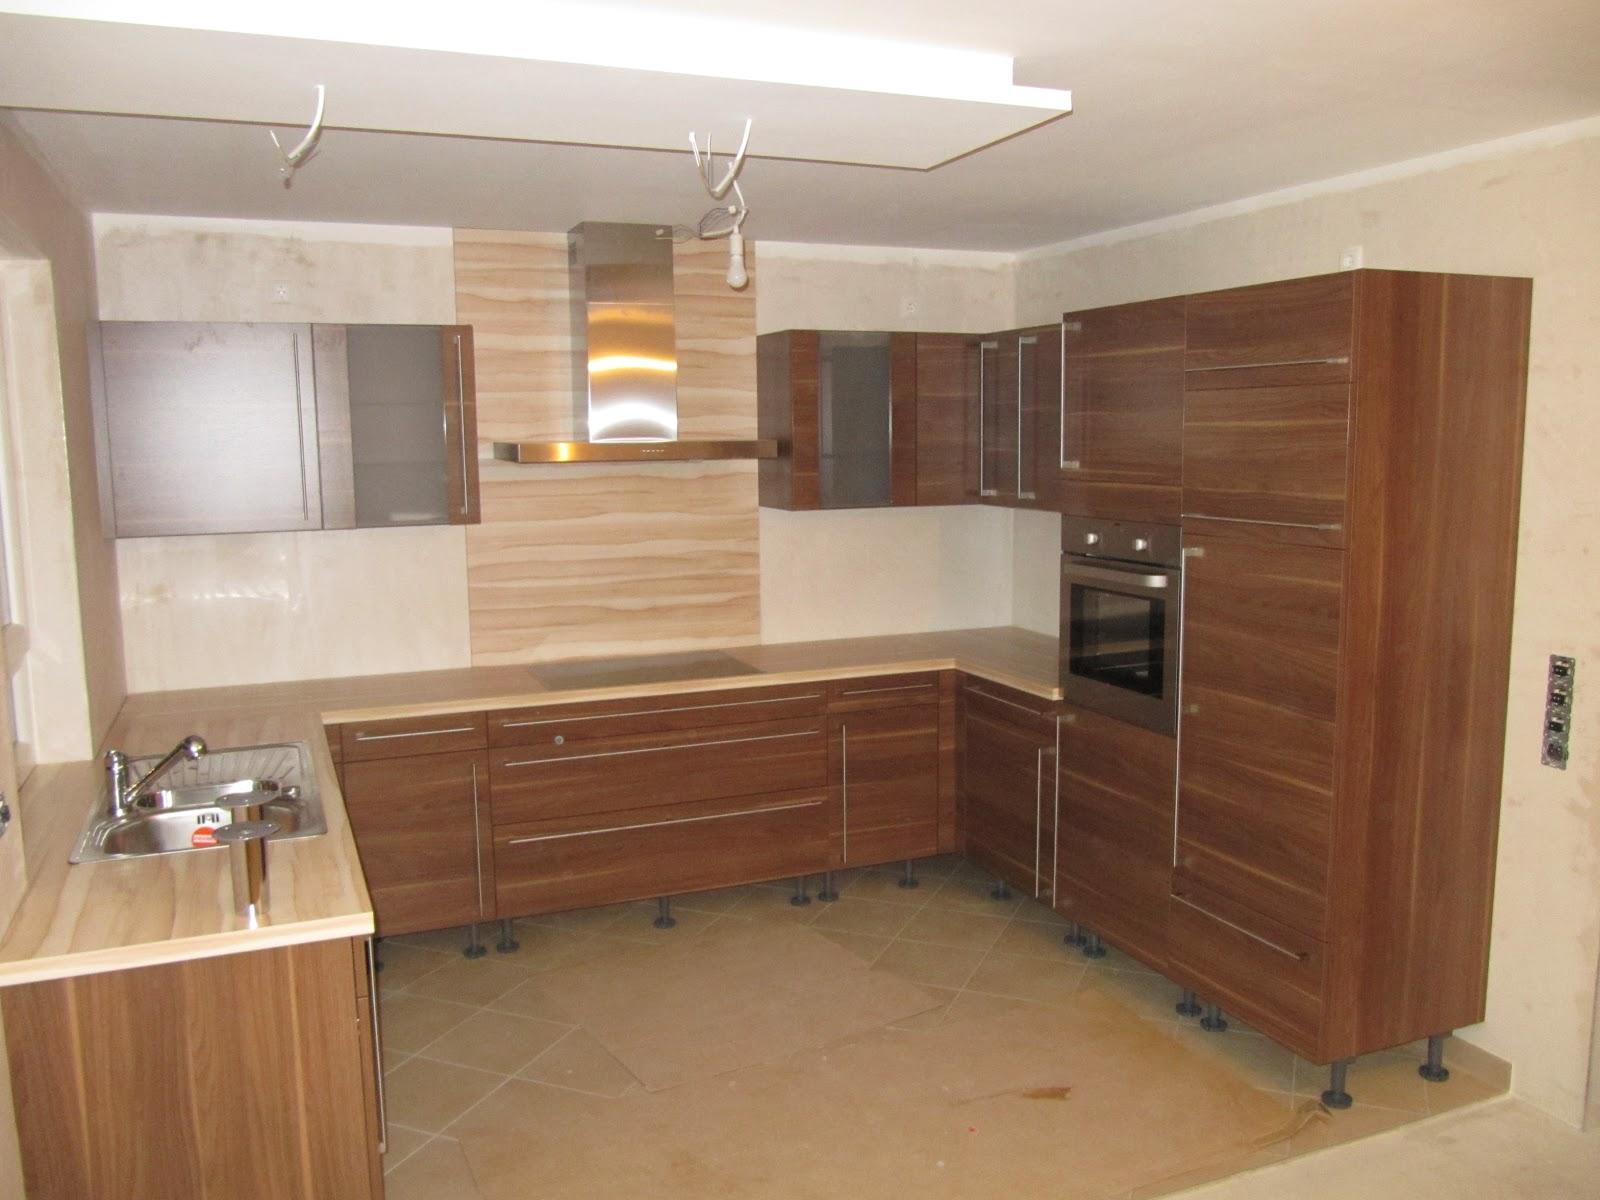 Küche Sockelblende Entfernen ~ küche sockel edelstahl ~ logisting com = elegante interior design di lusso per la casa